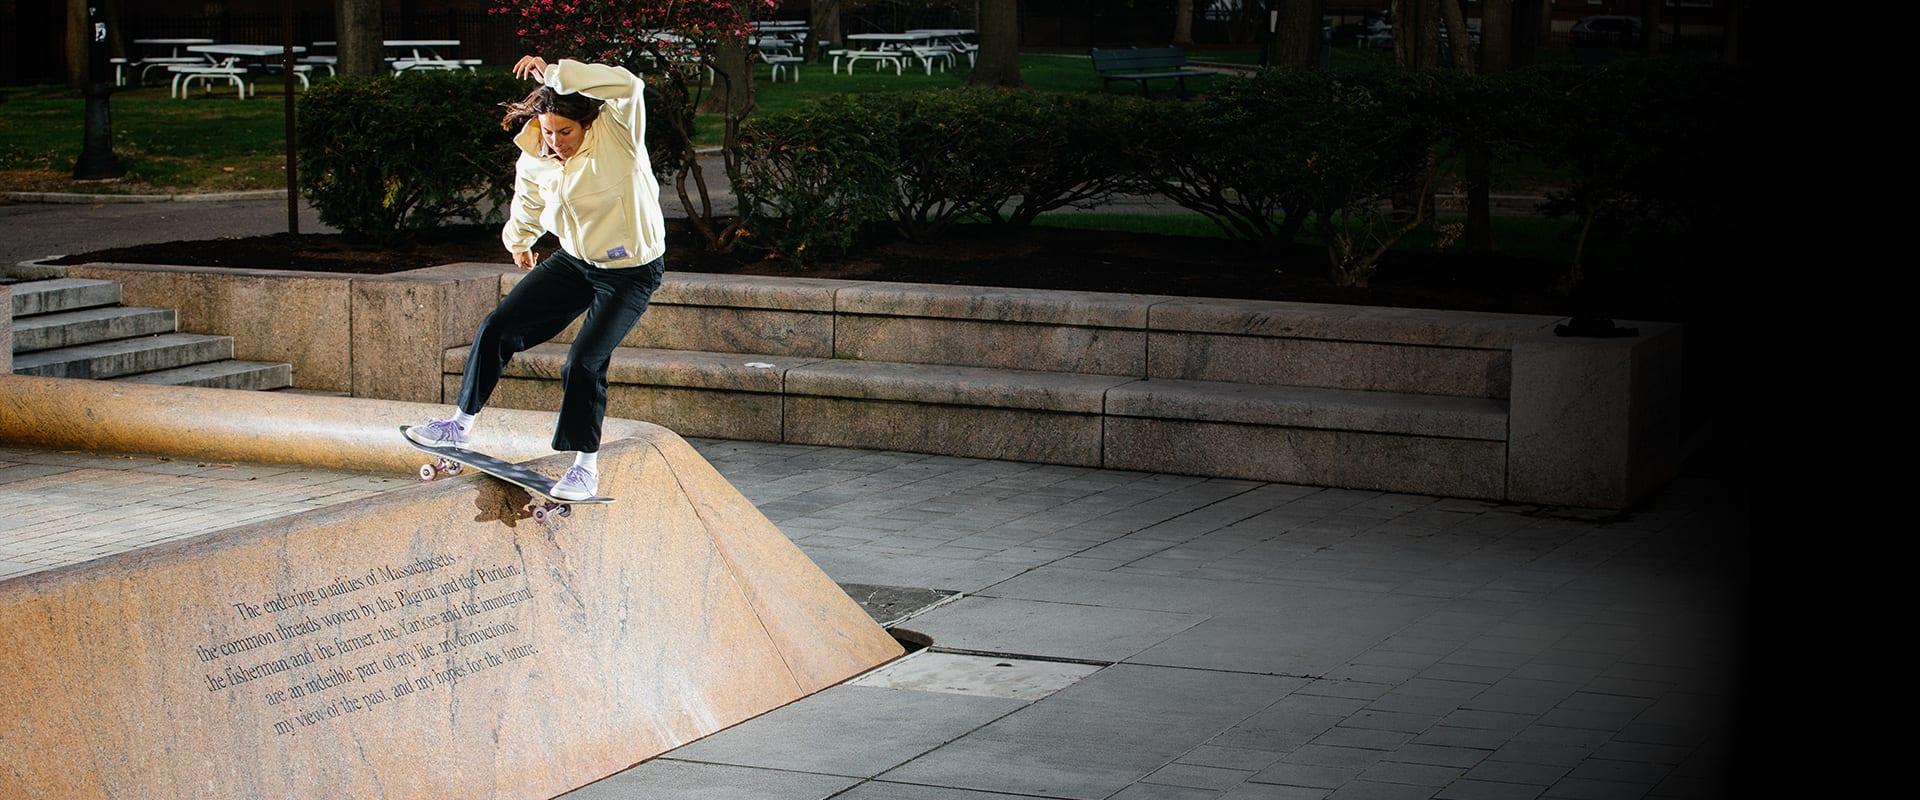 Skateboard dating sivusto